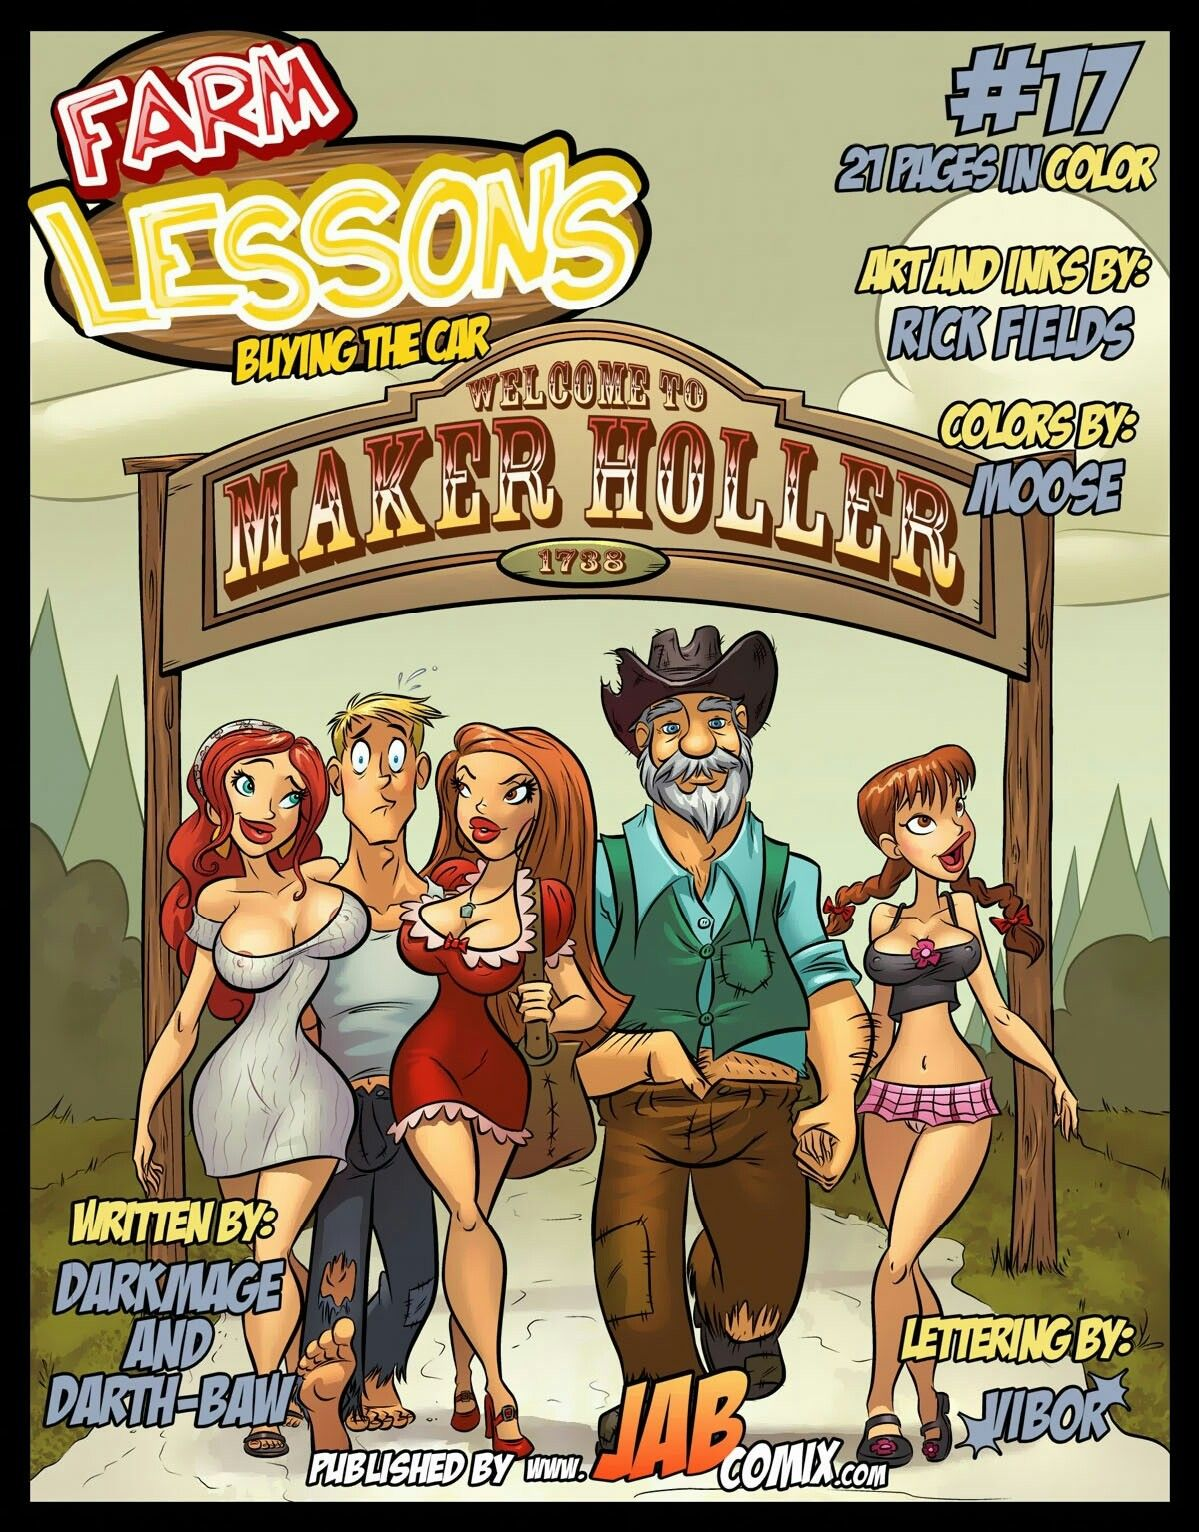 Remarkable topic Jab comix farm lesson comic